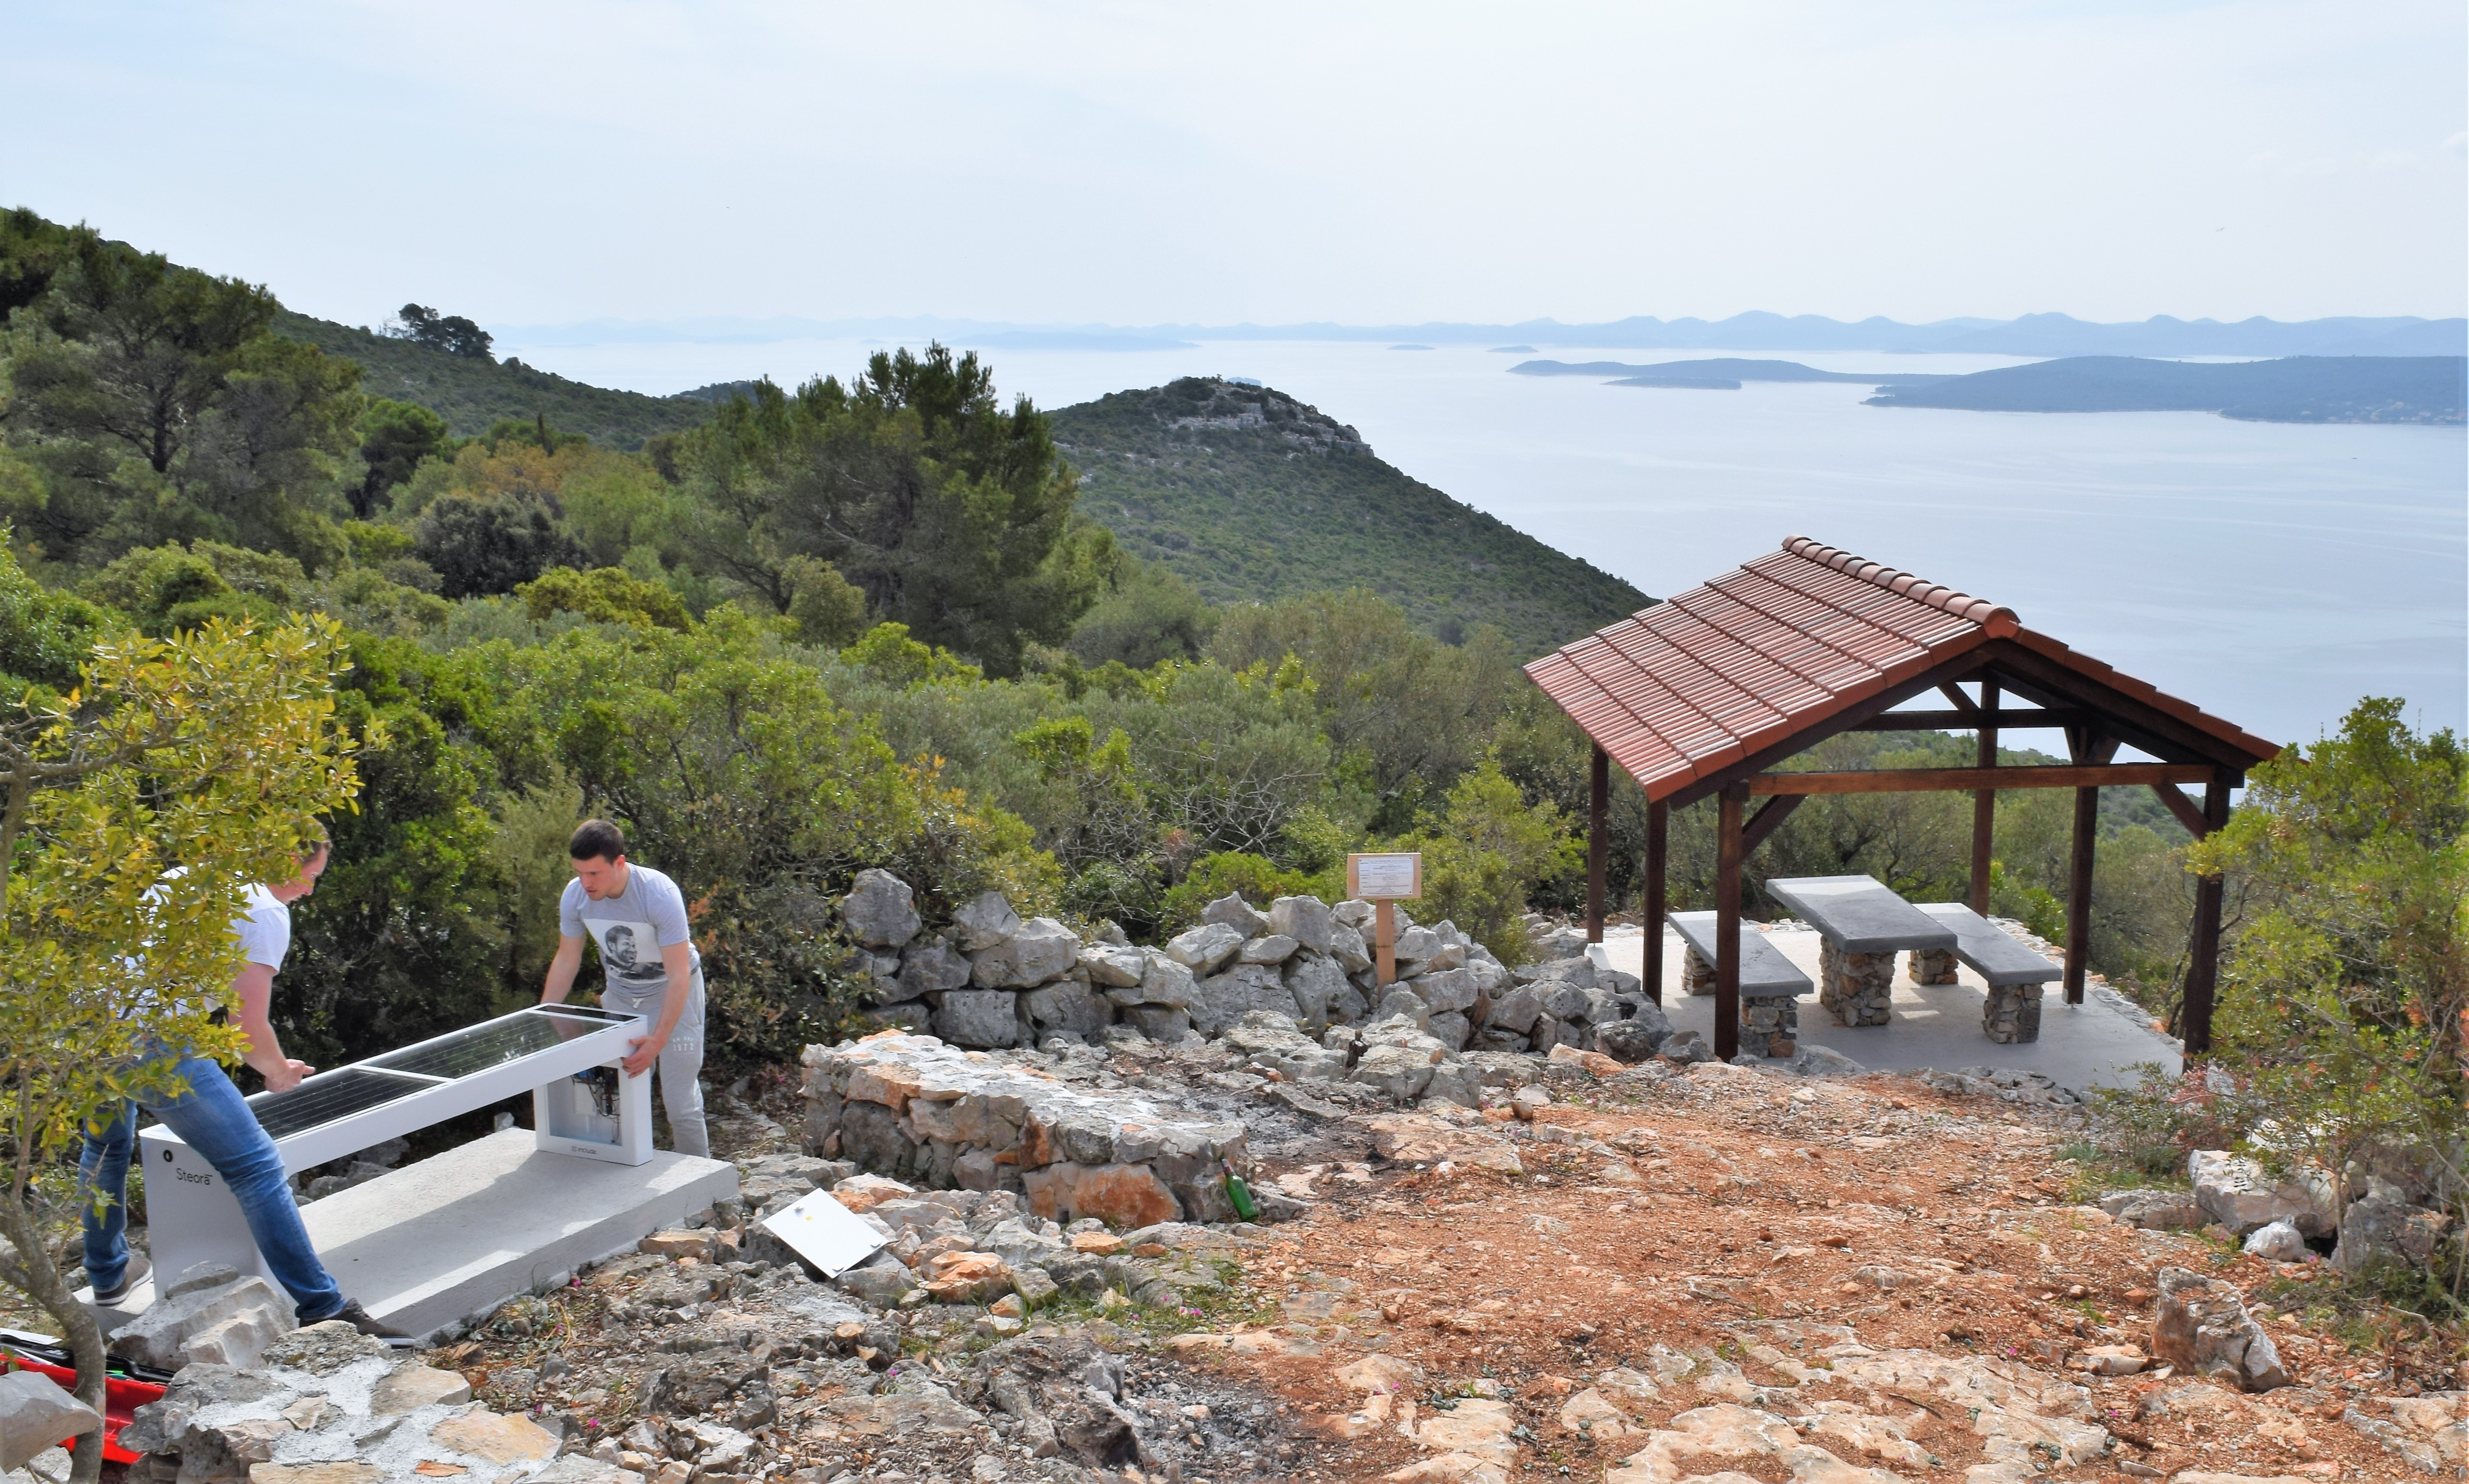 Avantura otok: Postavljene pametne klupe